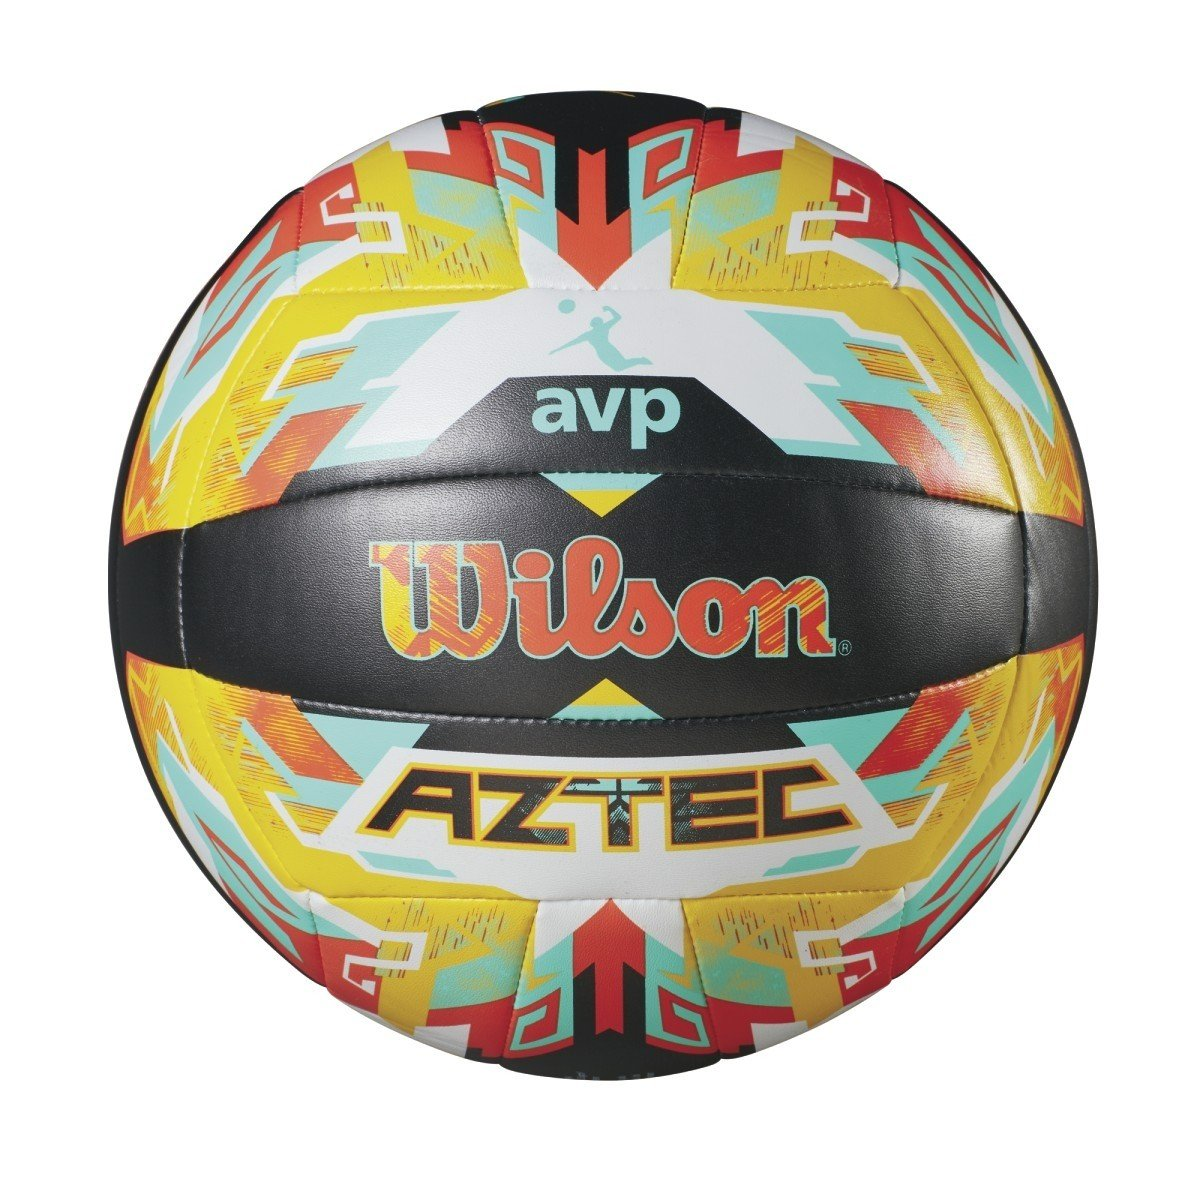 Wilson Pelota de vóley-playa, Exterior, Uso recreativo, Tamaño oficial, AVP AZTEC, Naranja/Azul, WTH5682XB Tamaño oficial